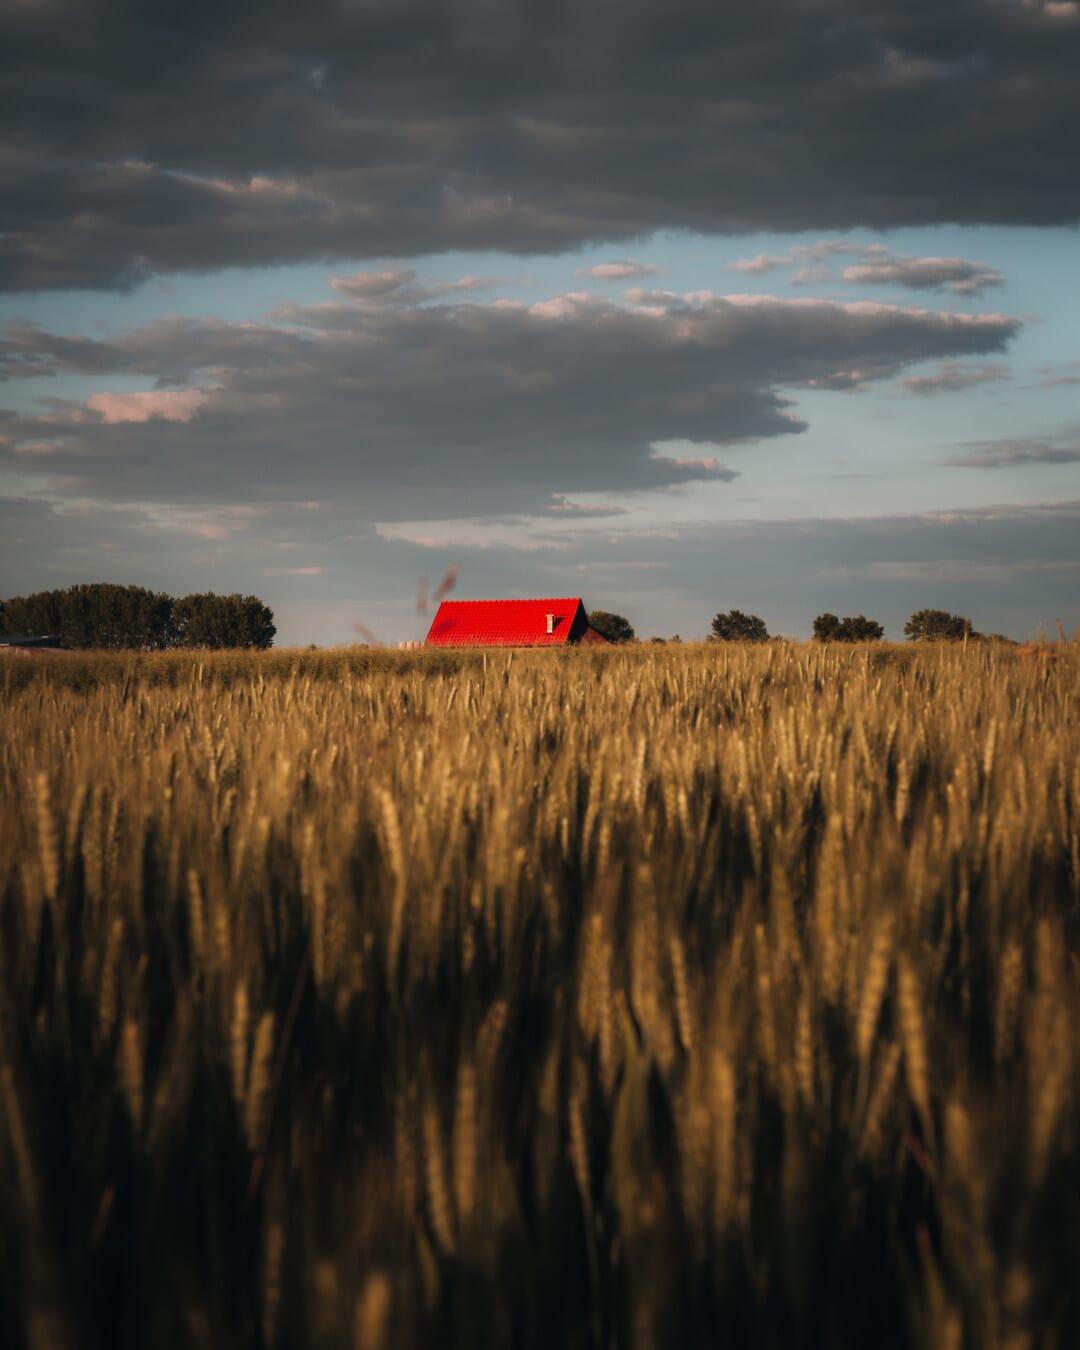 agriculture, field, landscape, nature, idyllic, farmland, farm, farmhouse, wheatfield, wheat